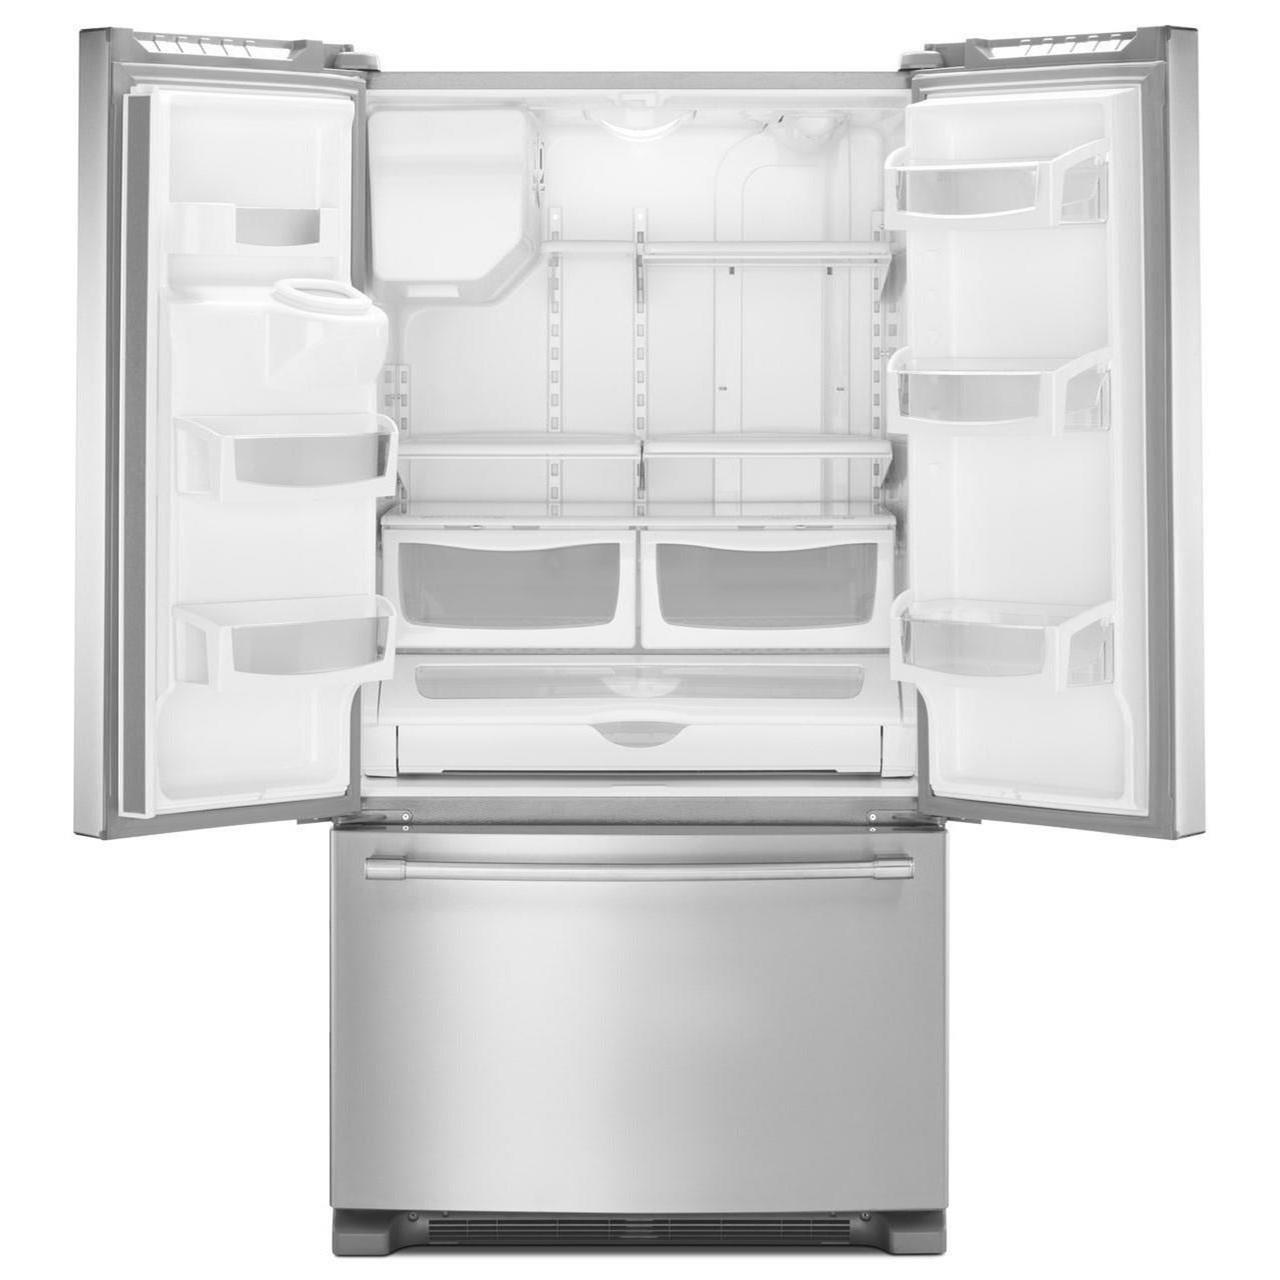 Maytag Mfi2570fez36 Inch Wide French Door Refrigerator